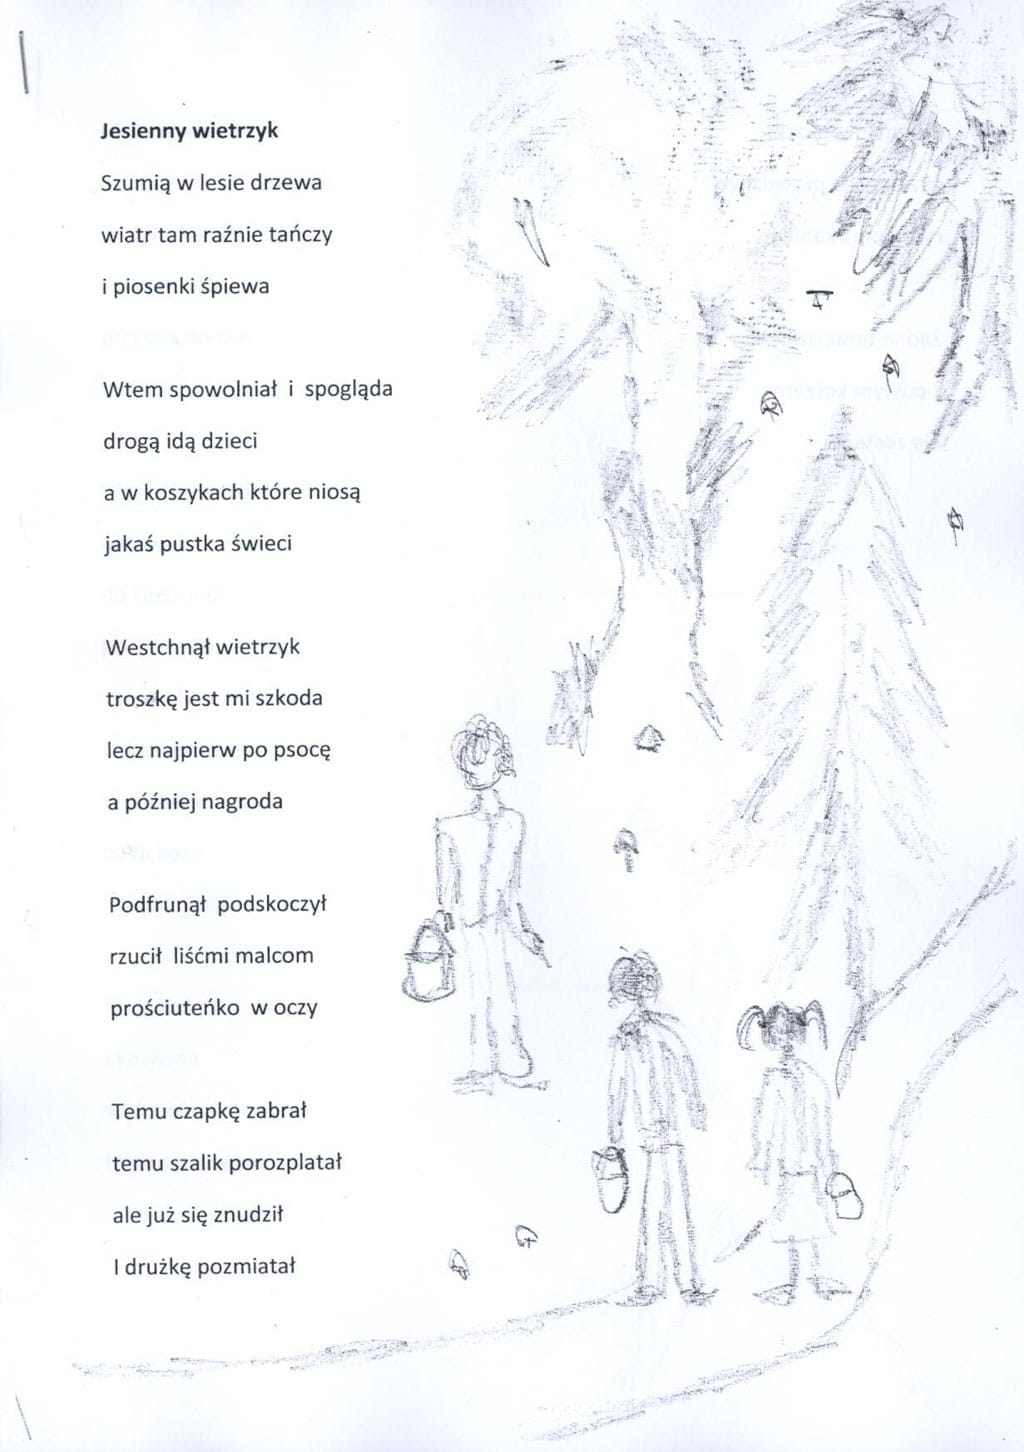 17_11_2016_wiersze_01